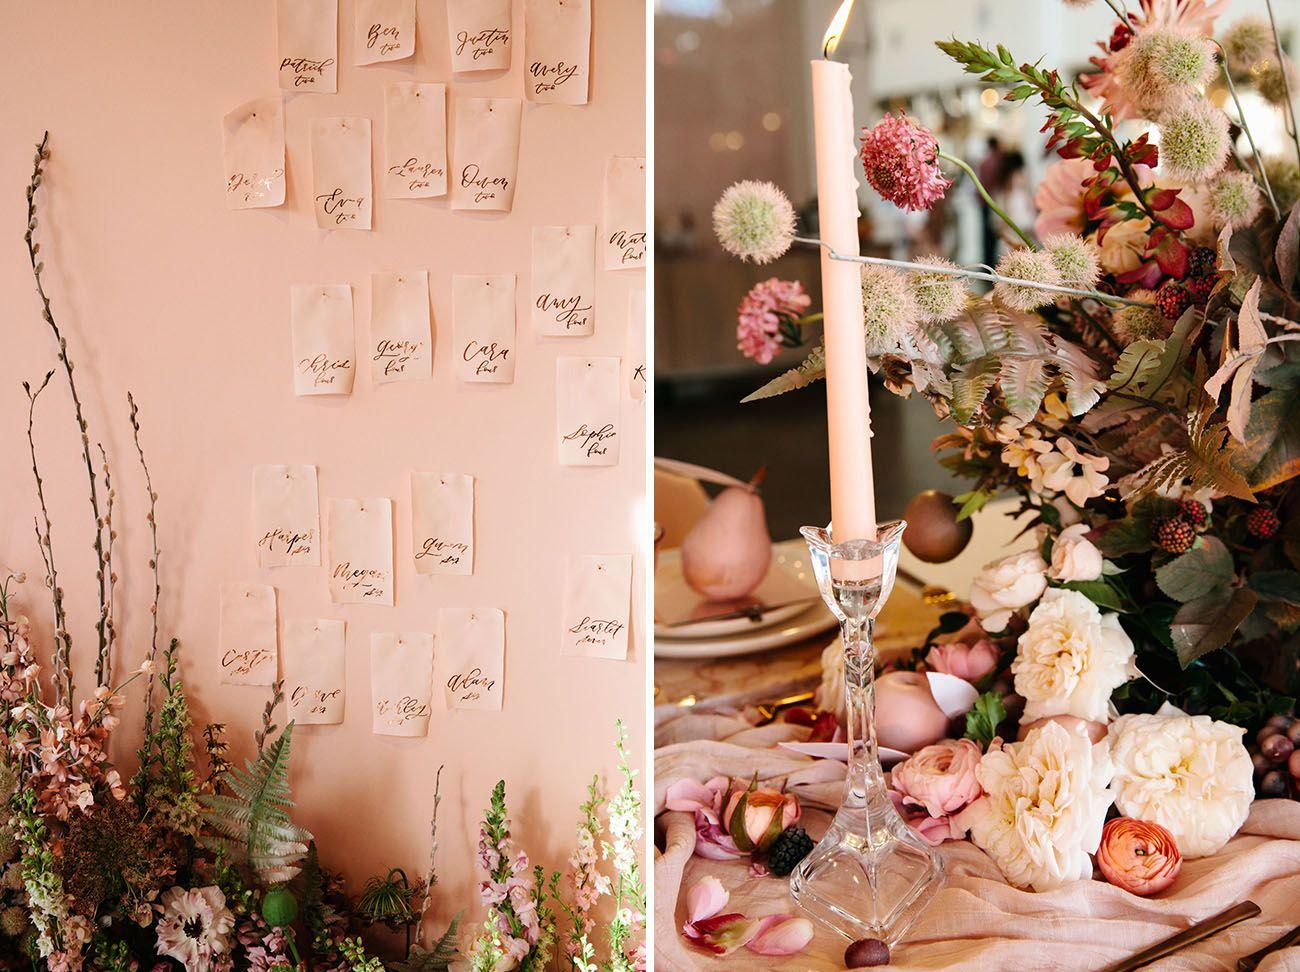 #placecards #wedding #flowers